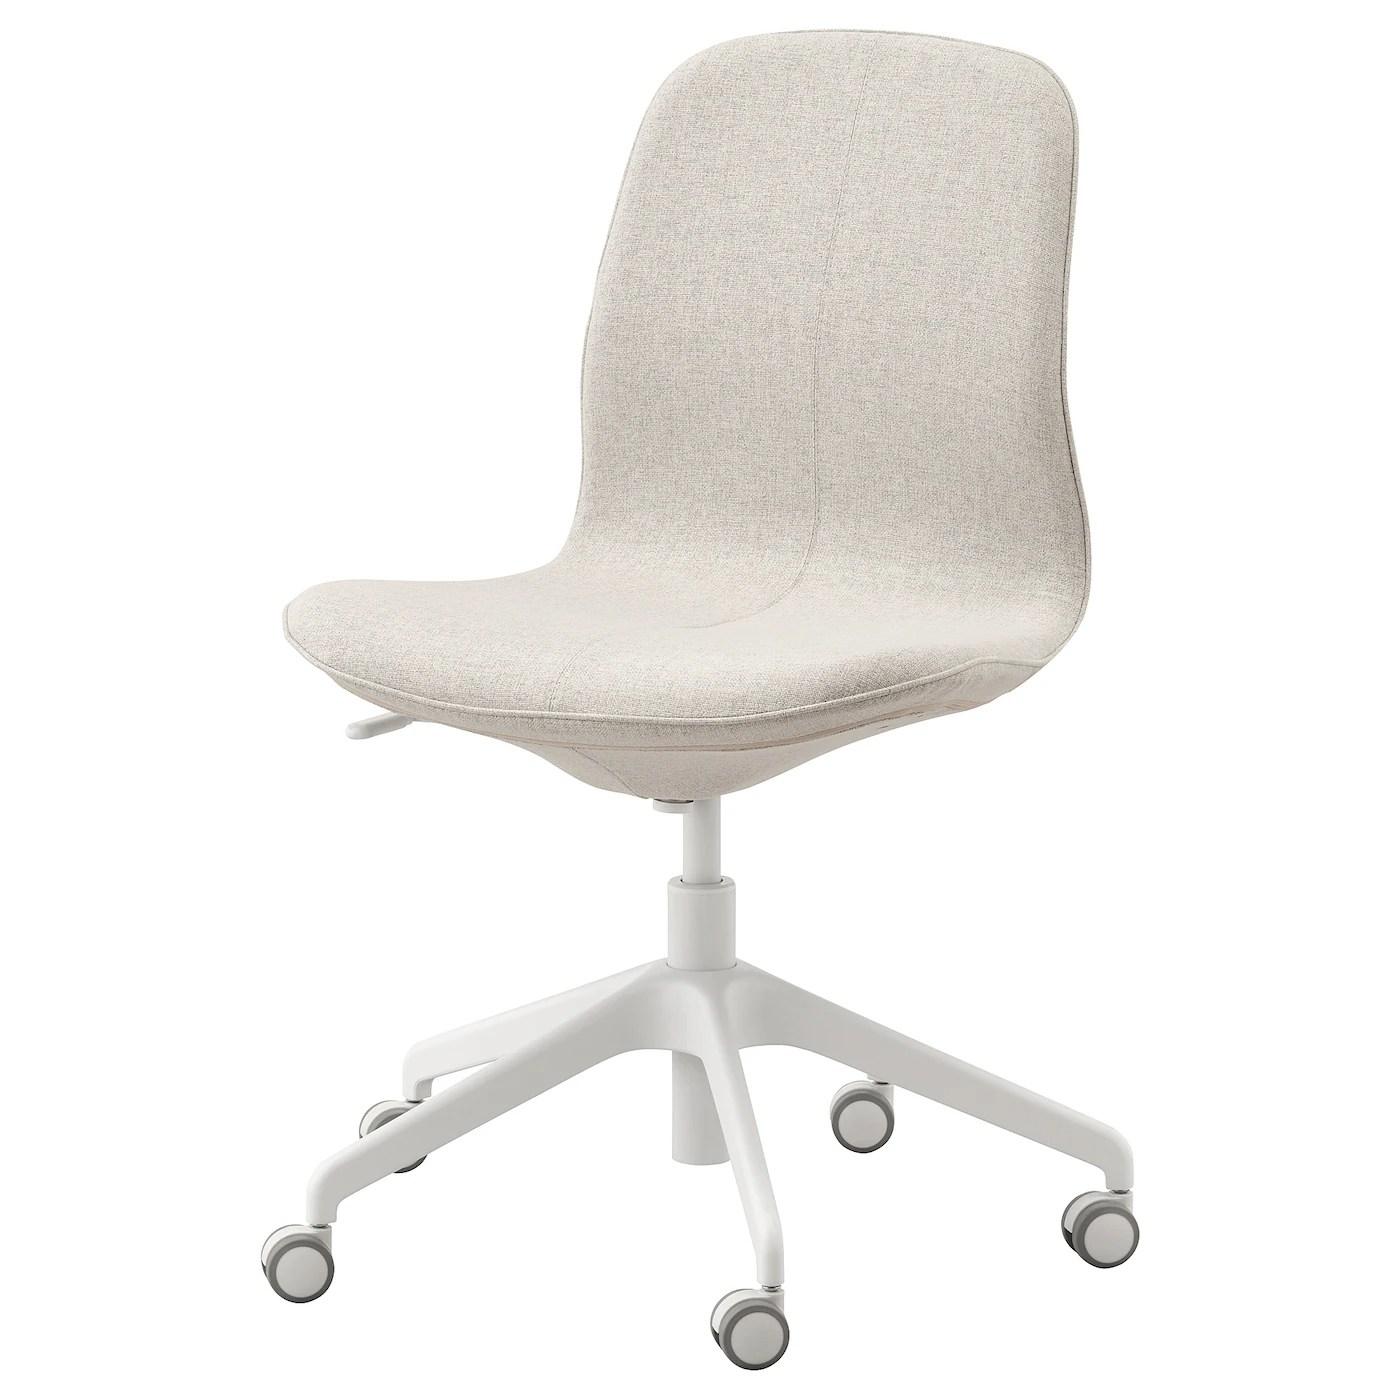 Langfjall Chaise De Bureau Gunnared Beige Blanc Pas Cher Ikea Ikea